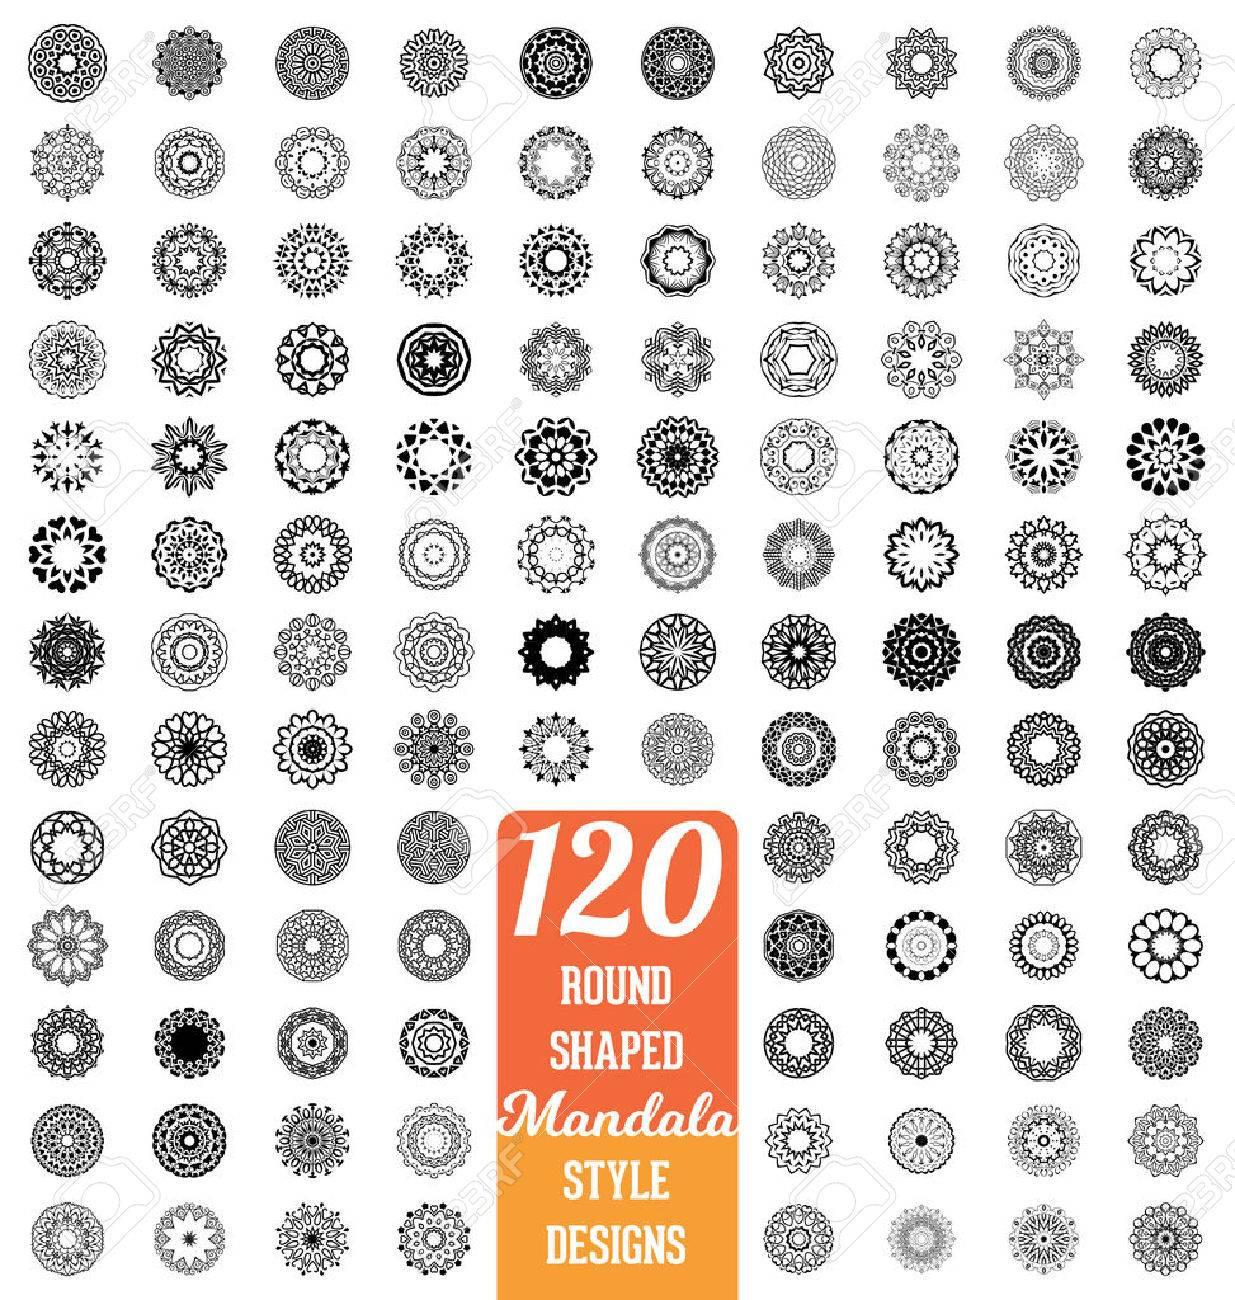 120 Round shaped Mandala style design collection - mega set of calligraphic ornamental elements - 45168097